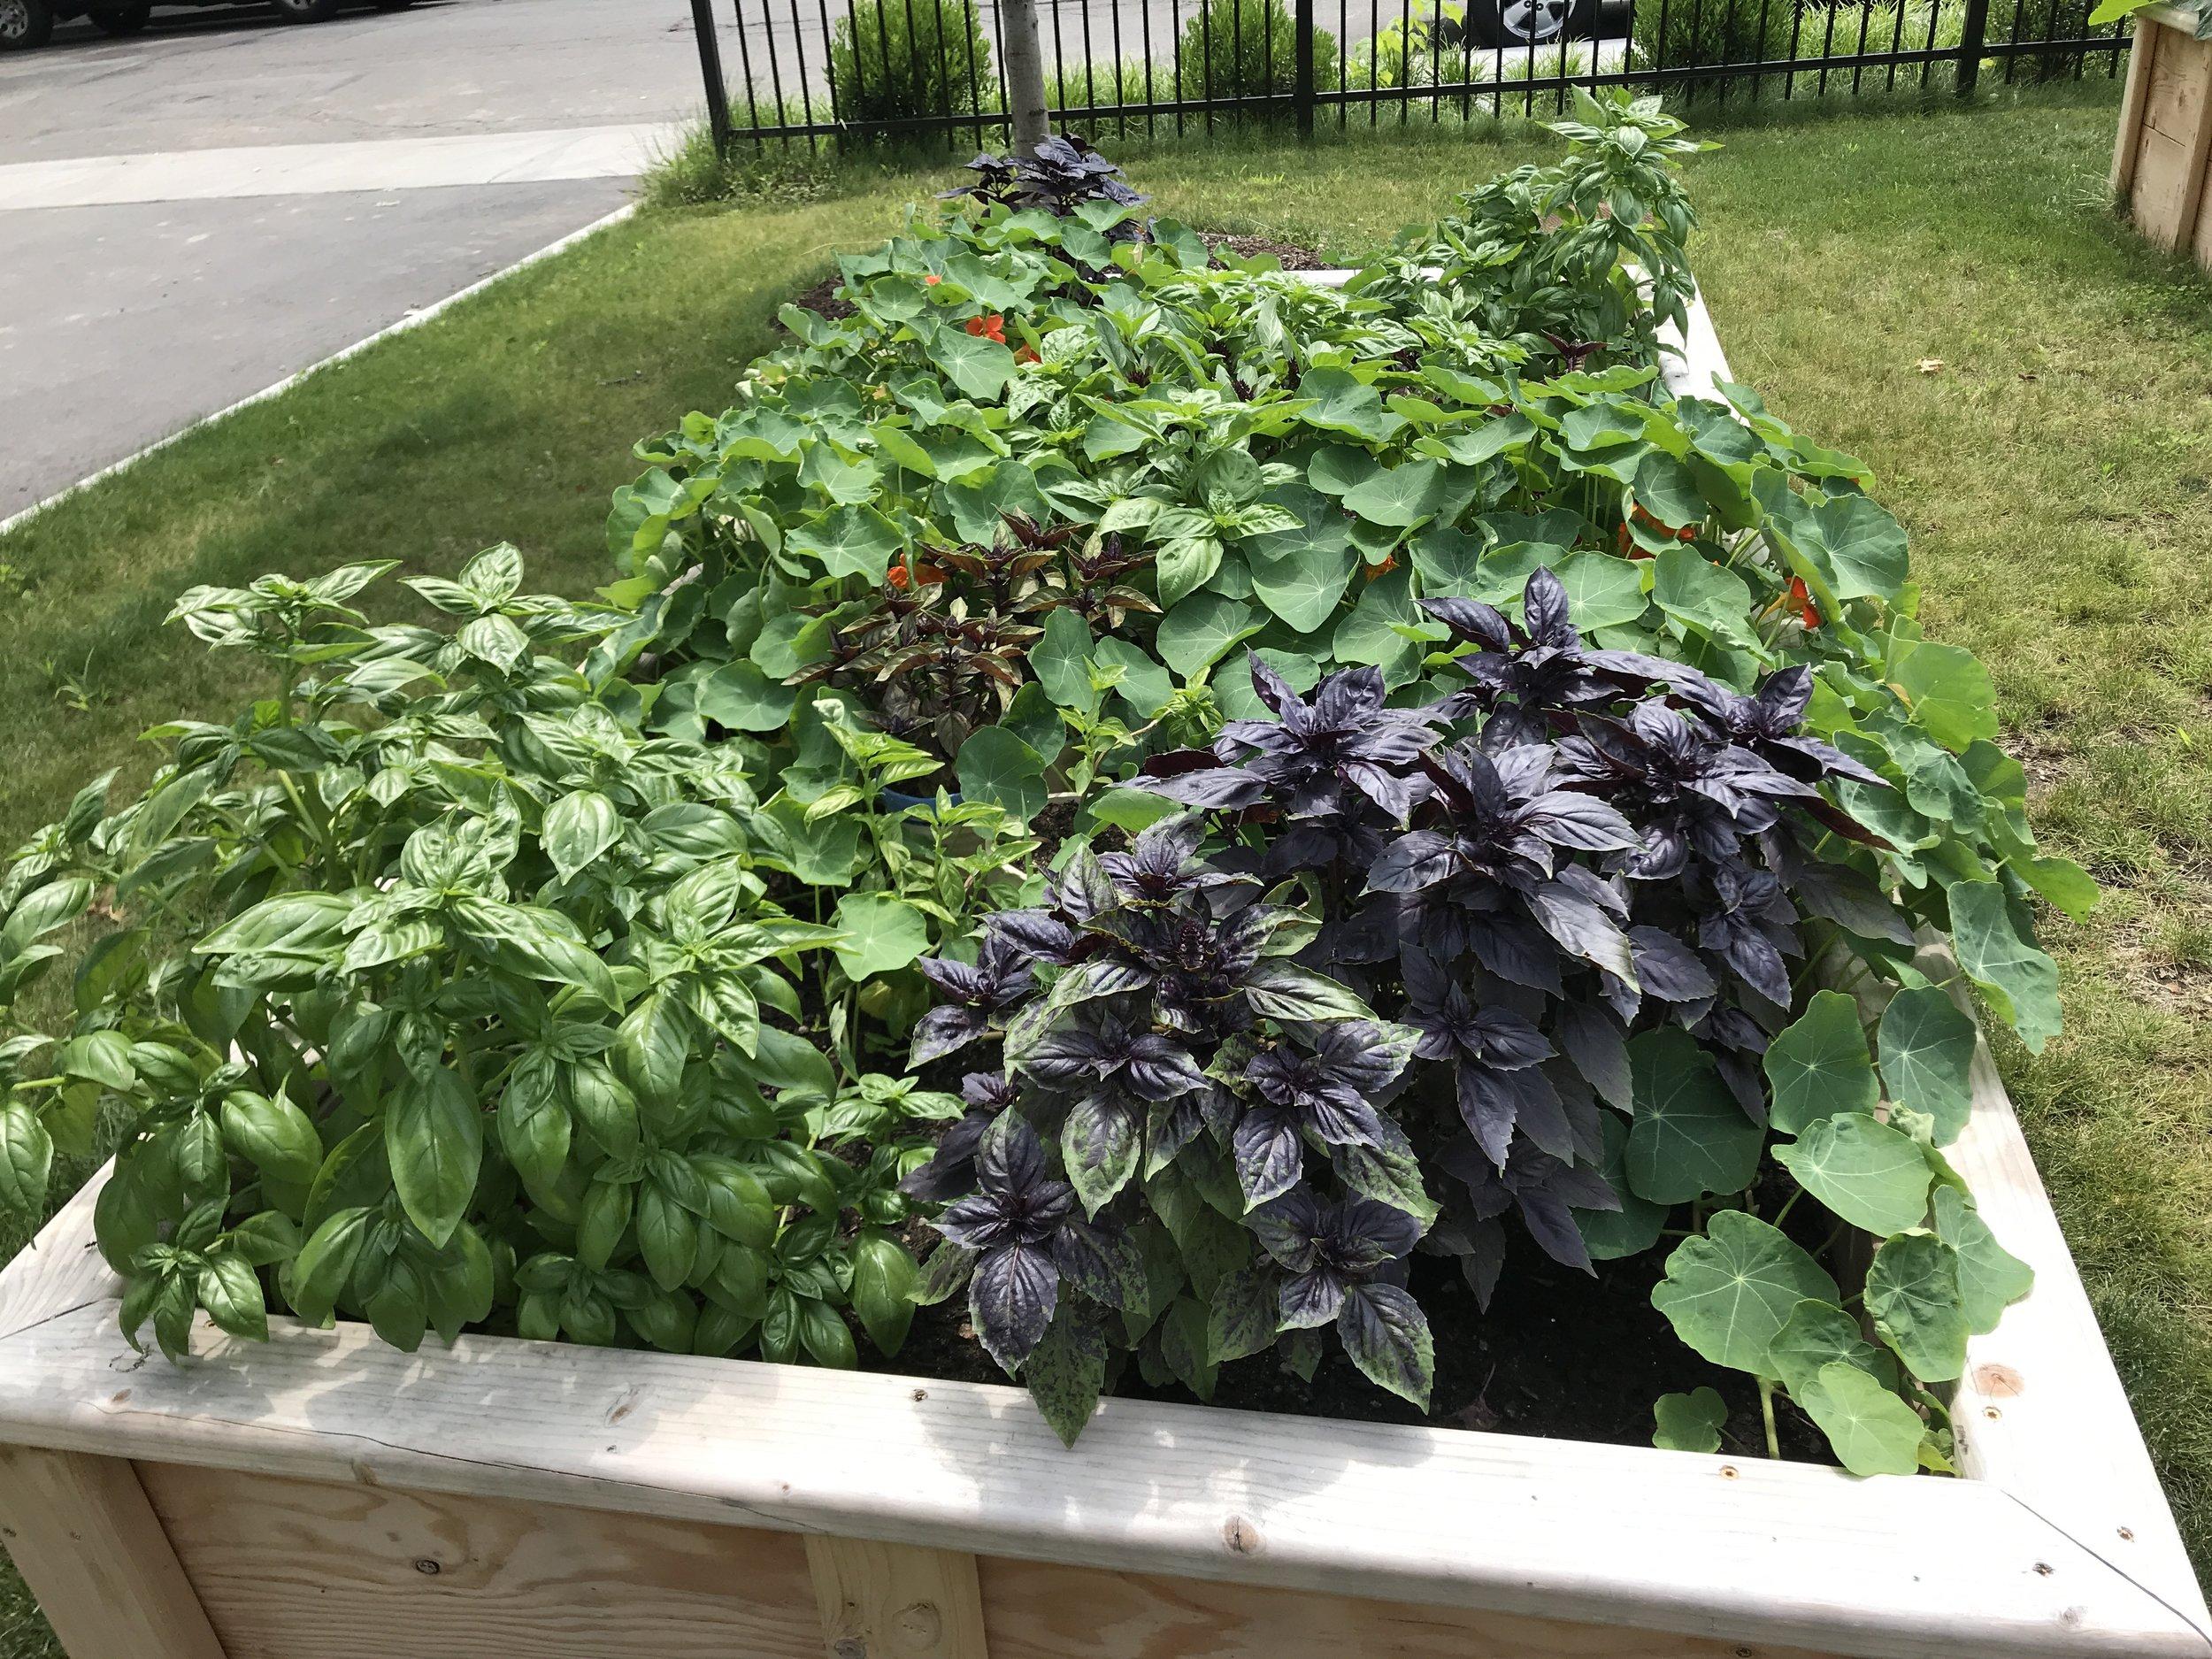 Our blooming veggies